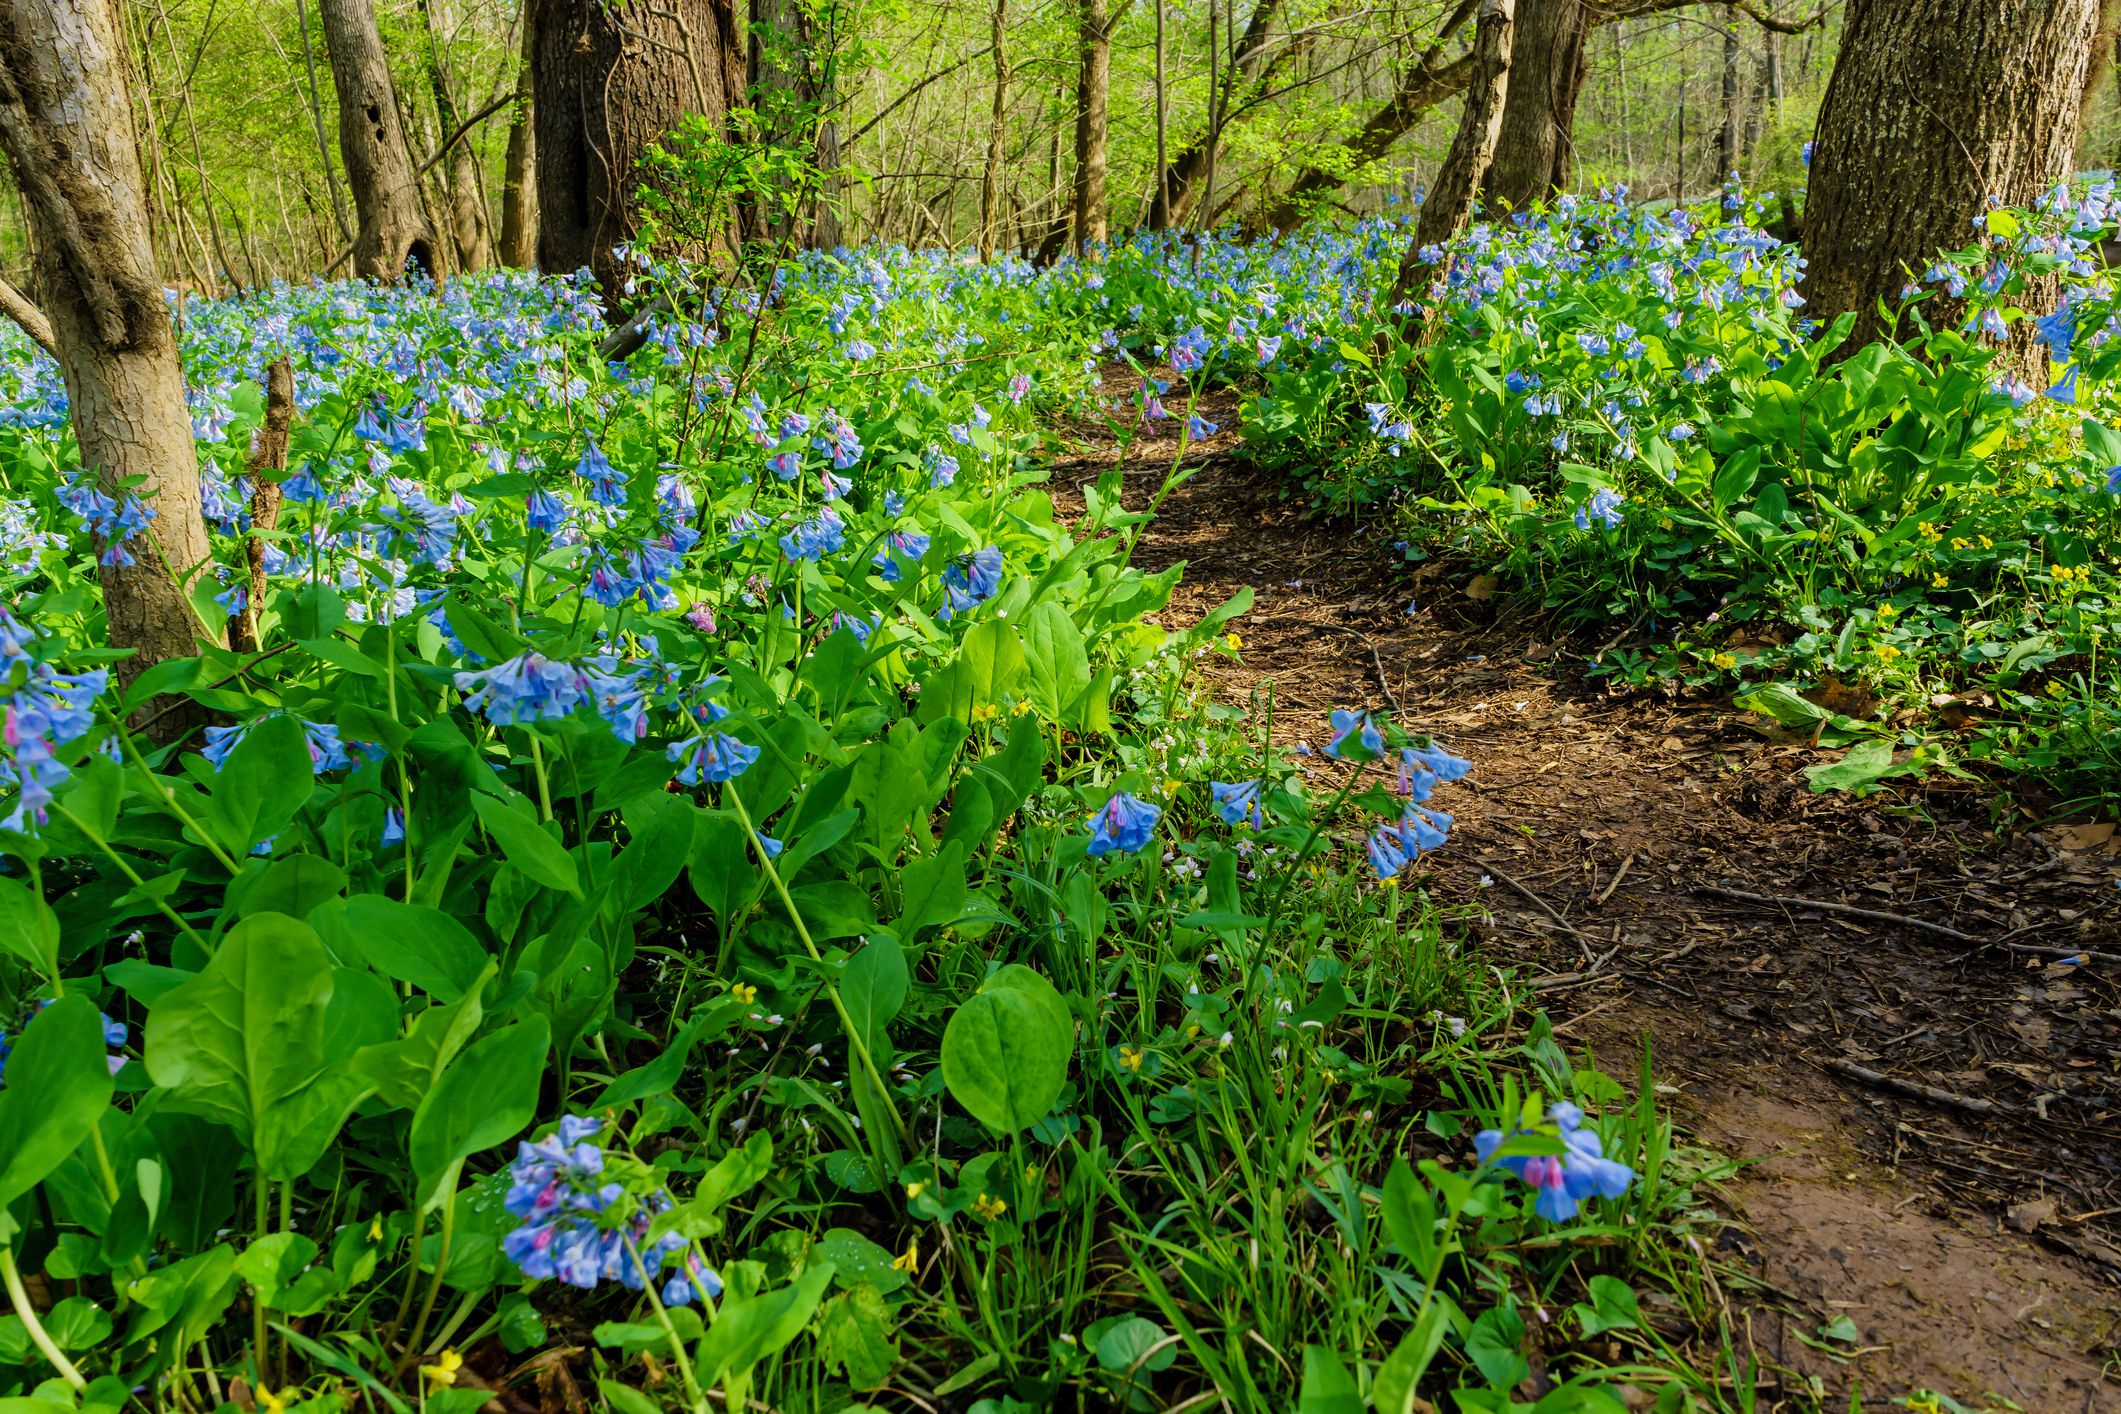 Mass of Virginia bluebells flowering in the woods.